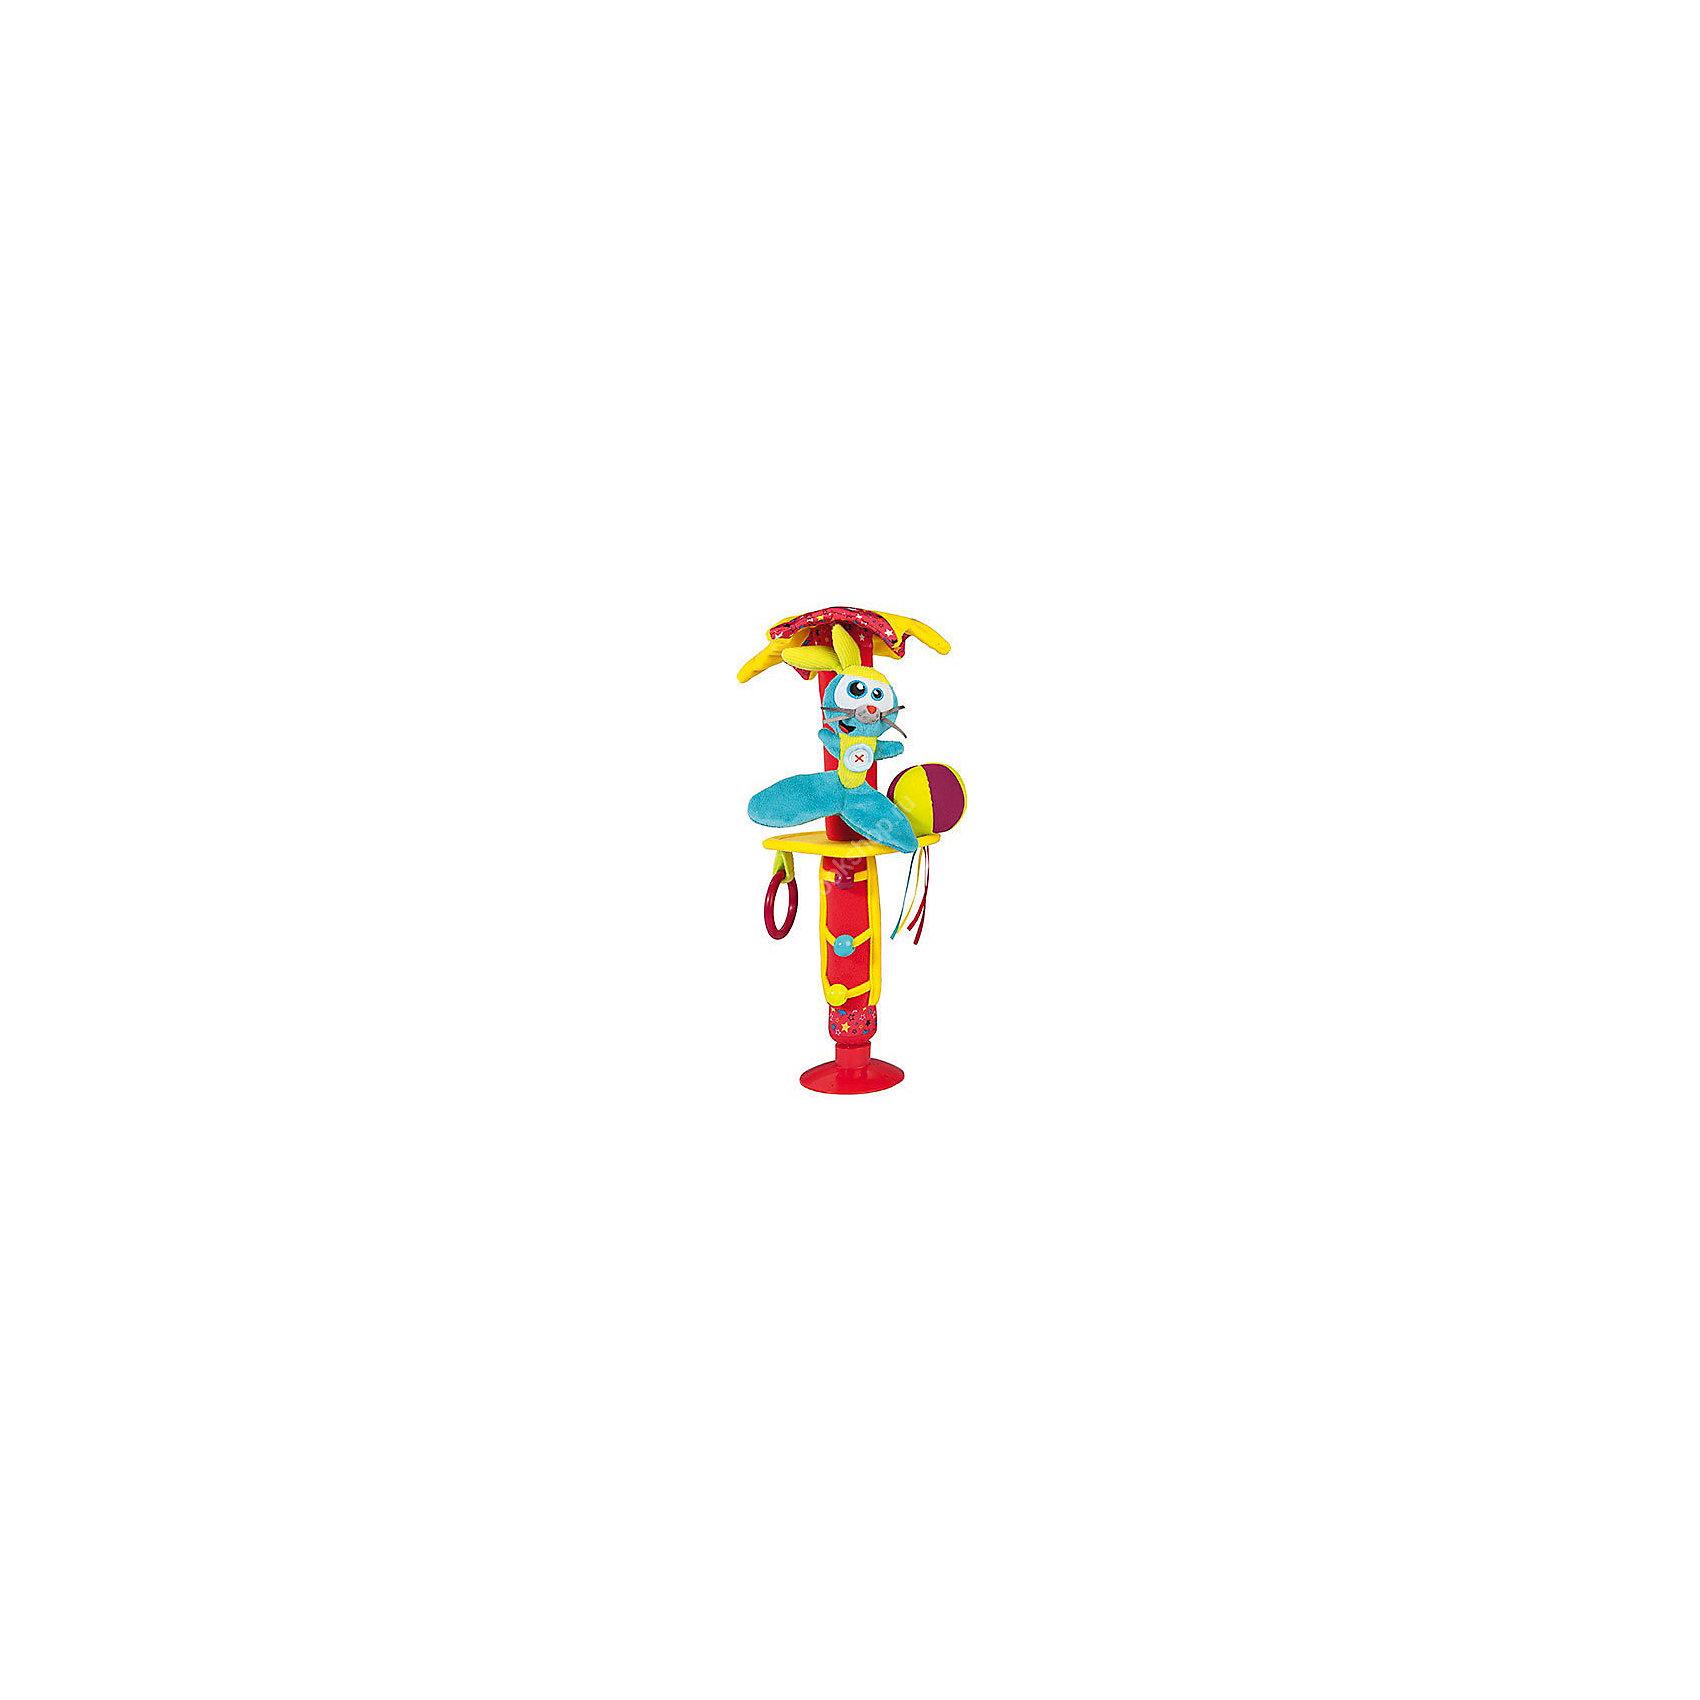 Babymoov Игрушка в автомобиль А105904, Babymoov babymoov